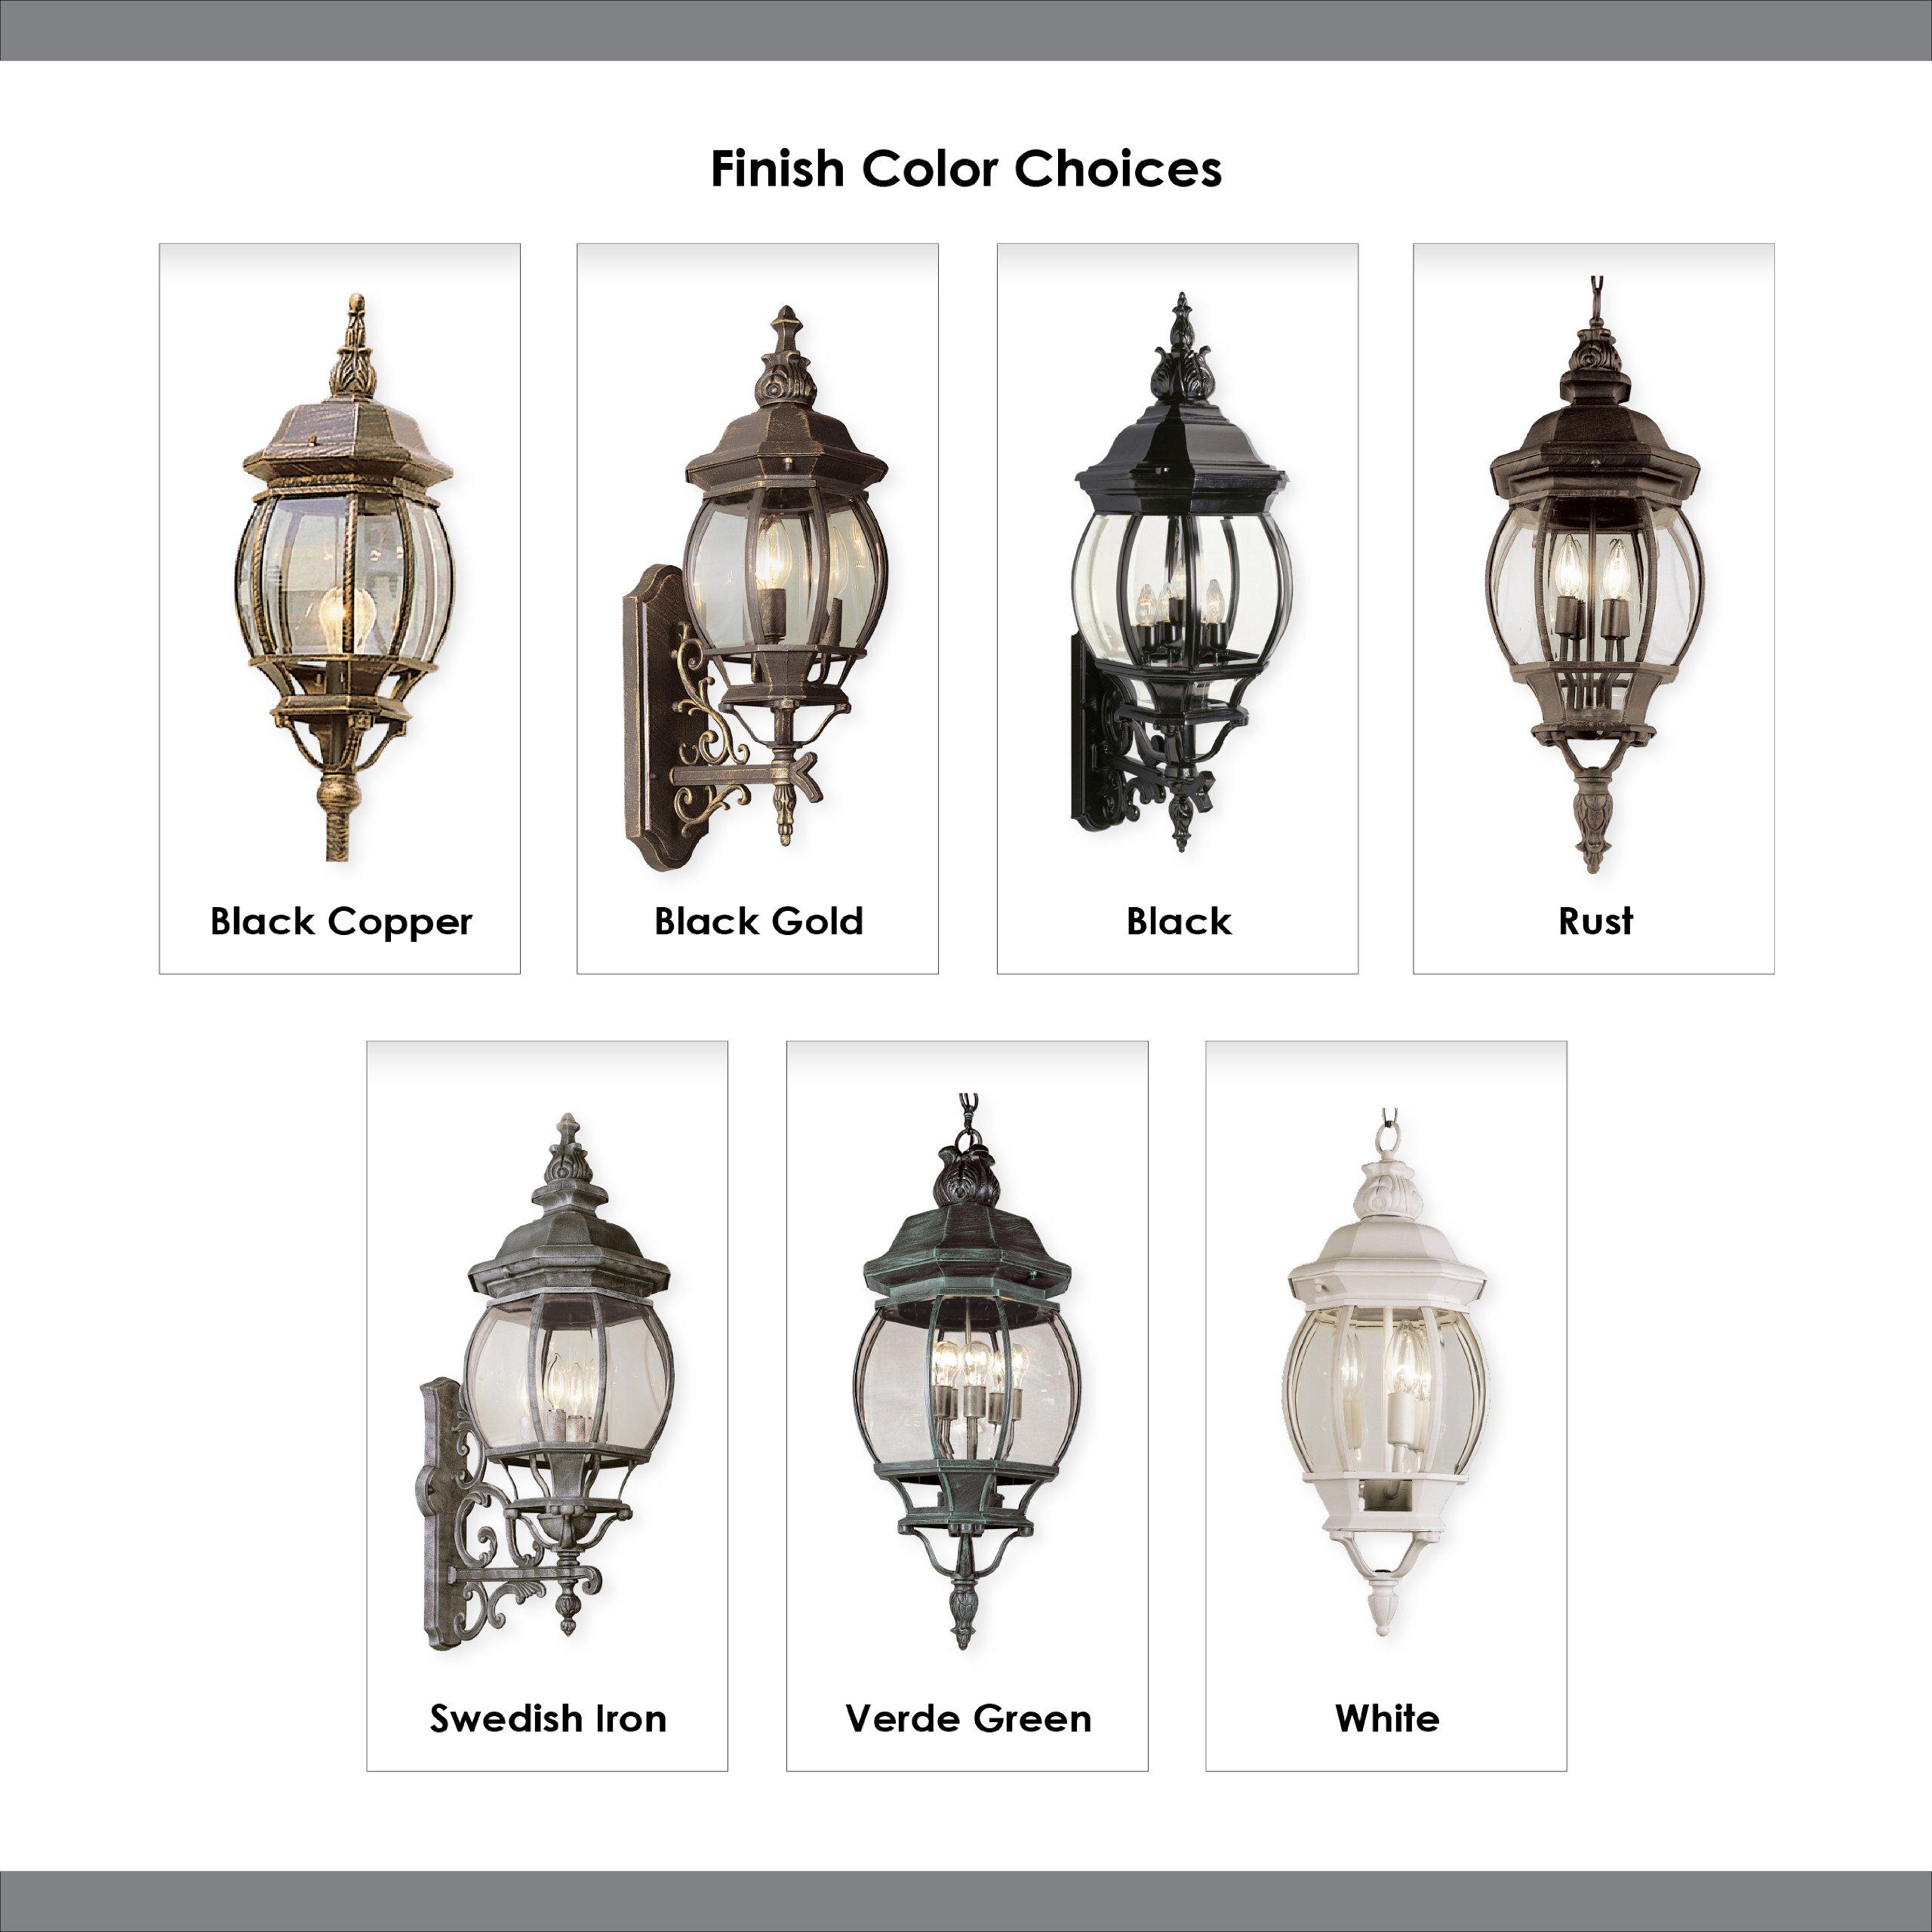 Trans Globe Lighting 4090 BK Outdoor Parkway 91.5'' Pole Light, Black by Bel Air Lighting (Image #1)